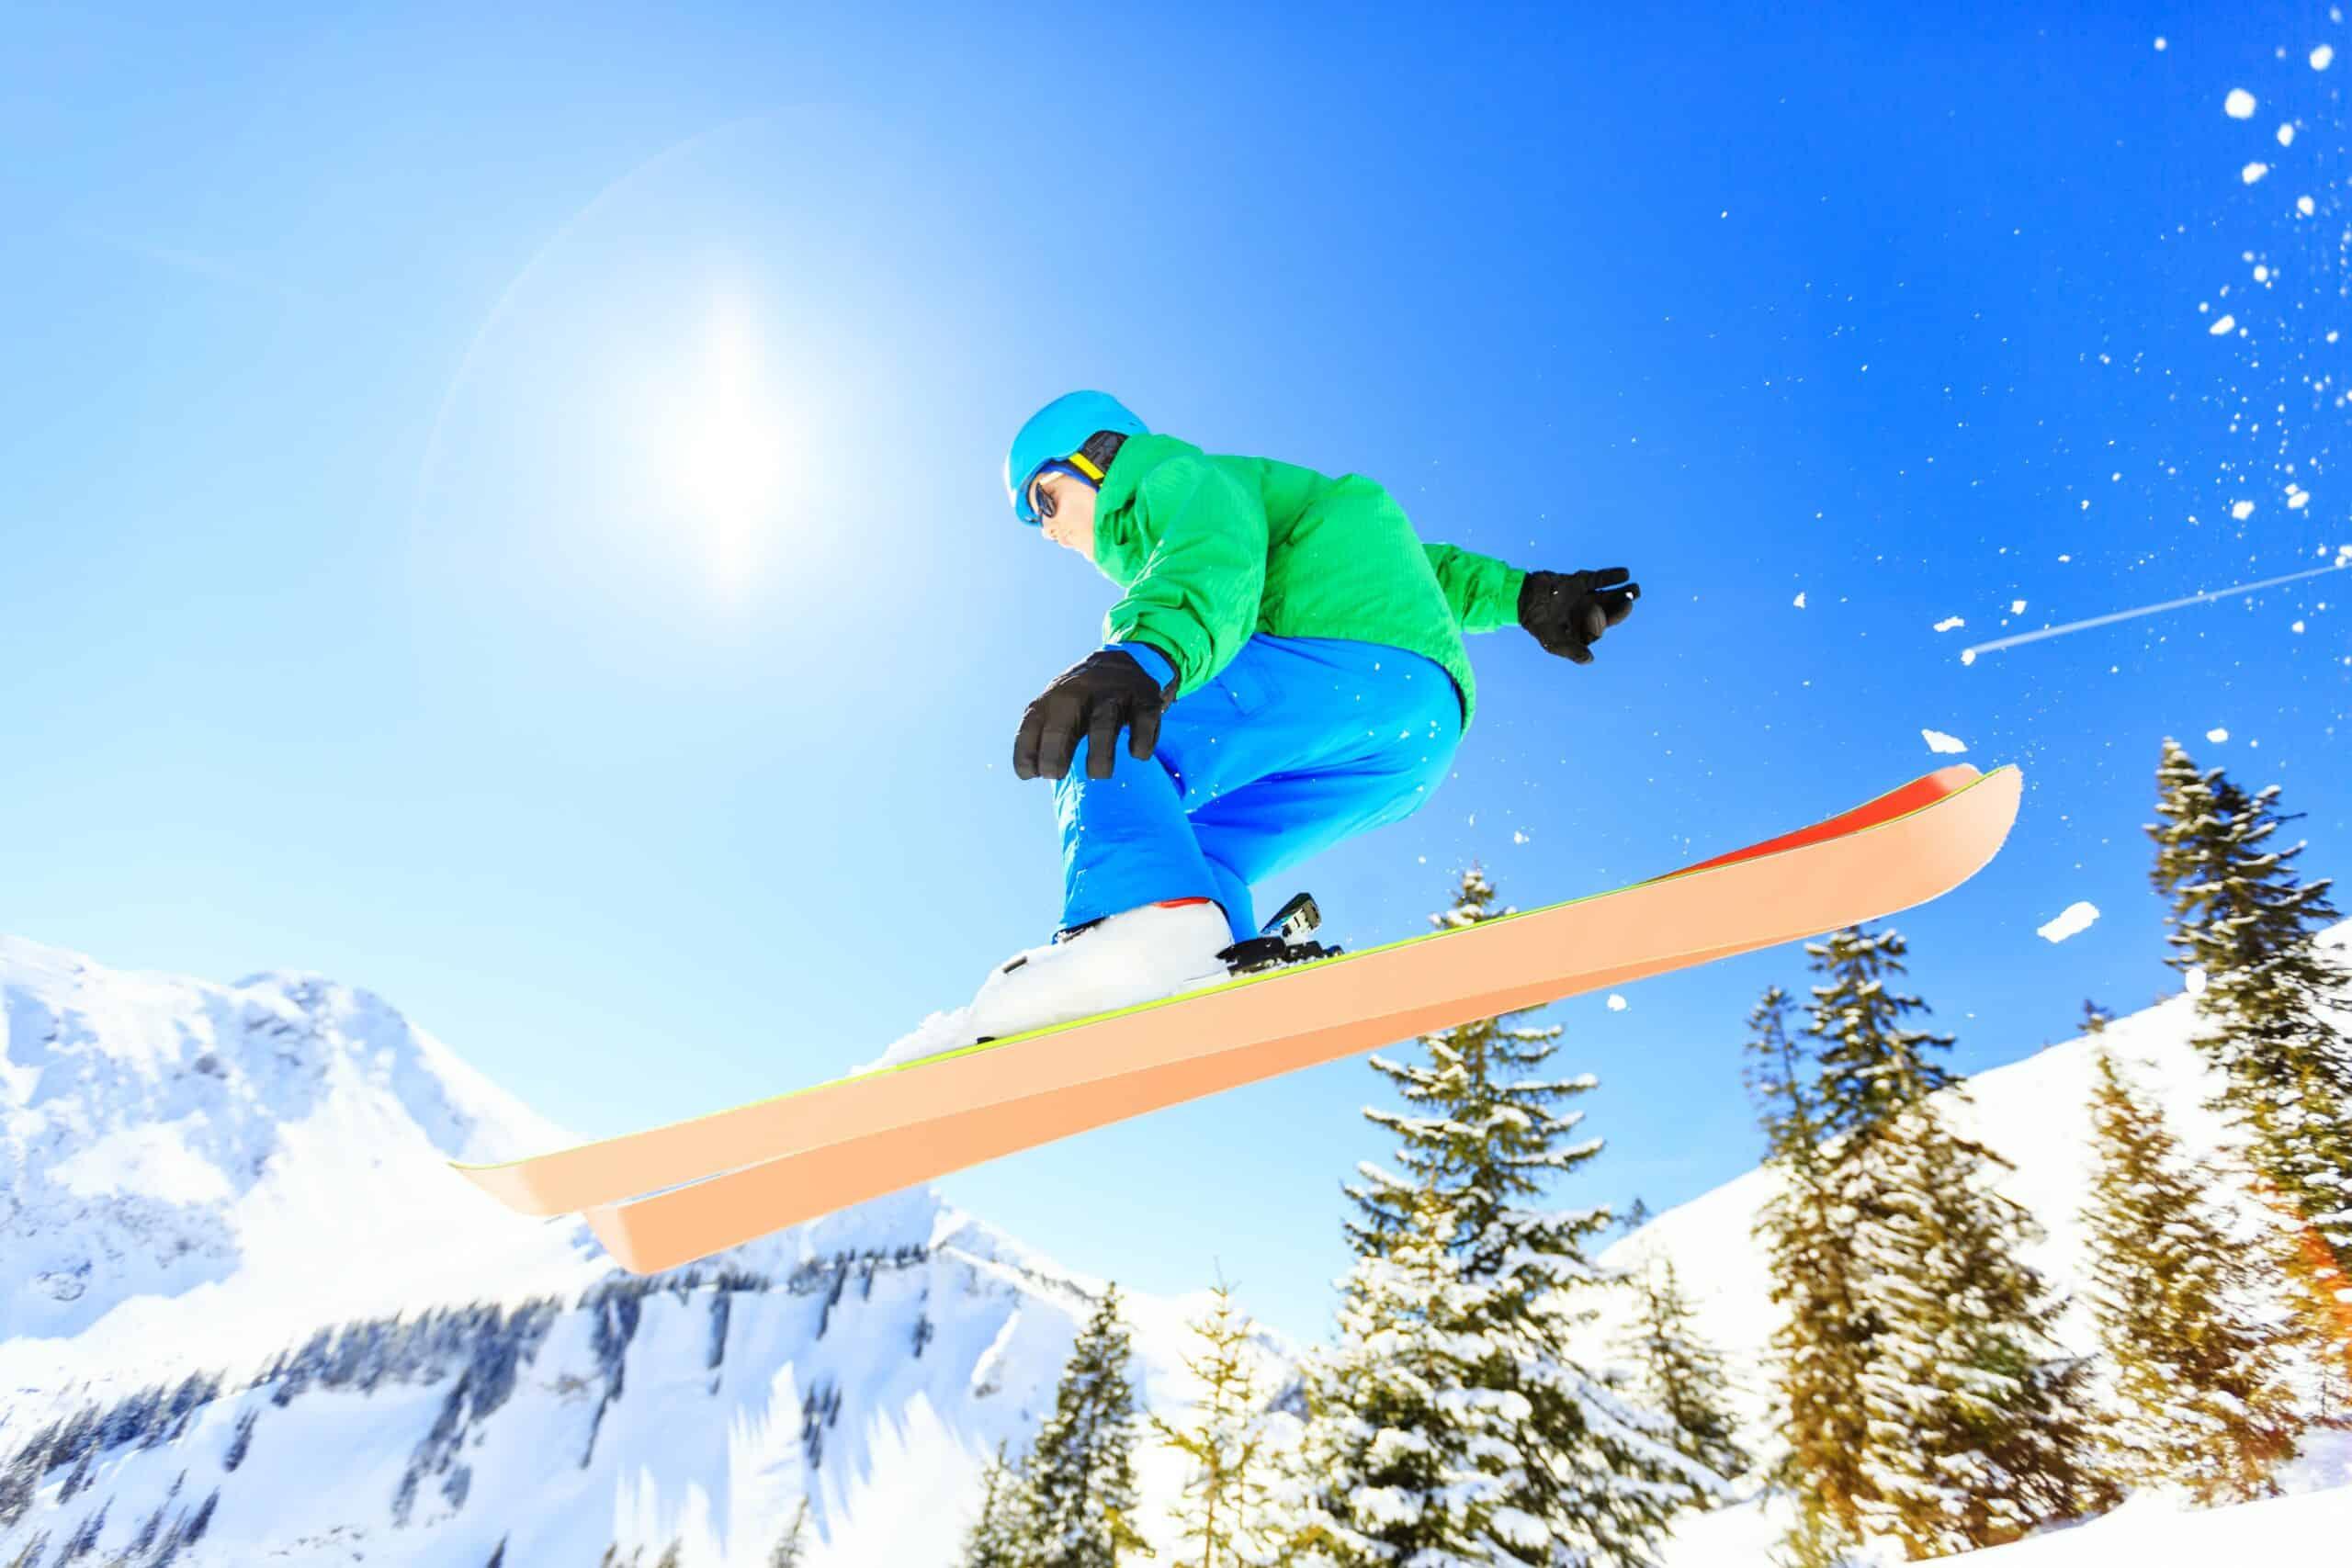 Man in rental ski boots